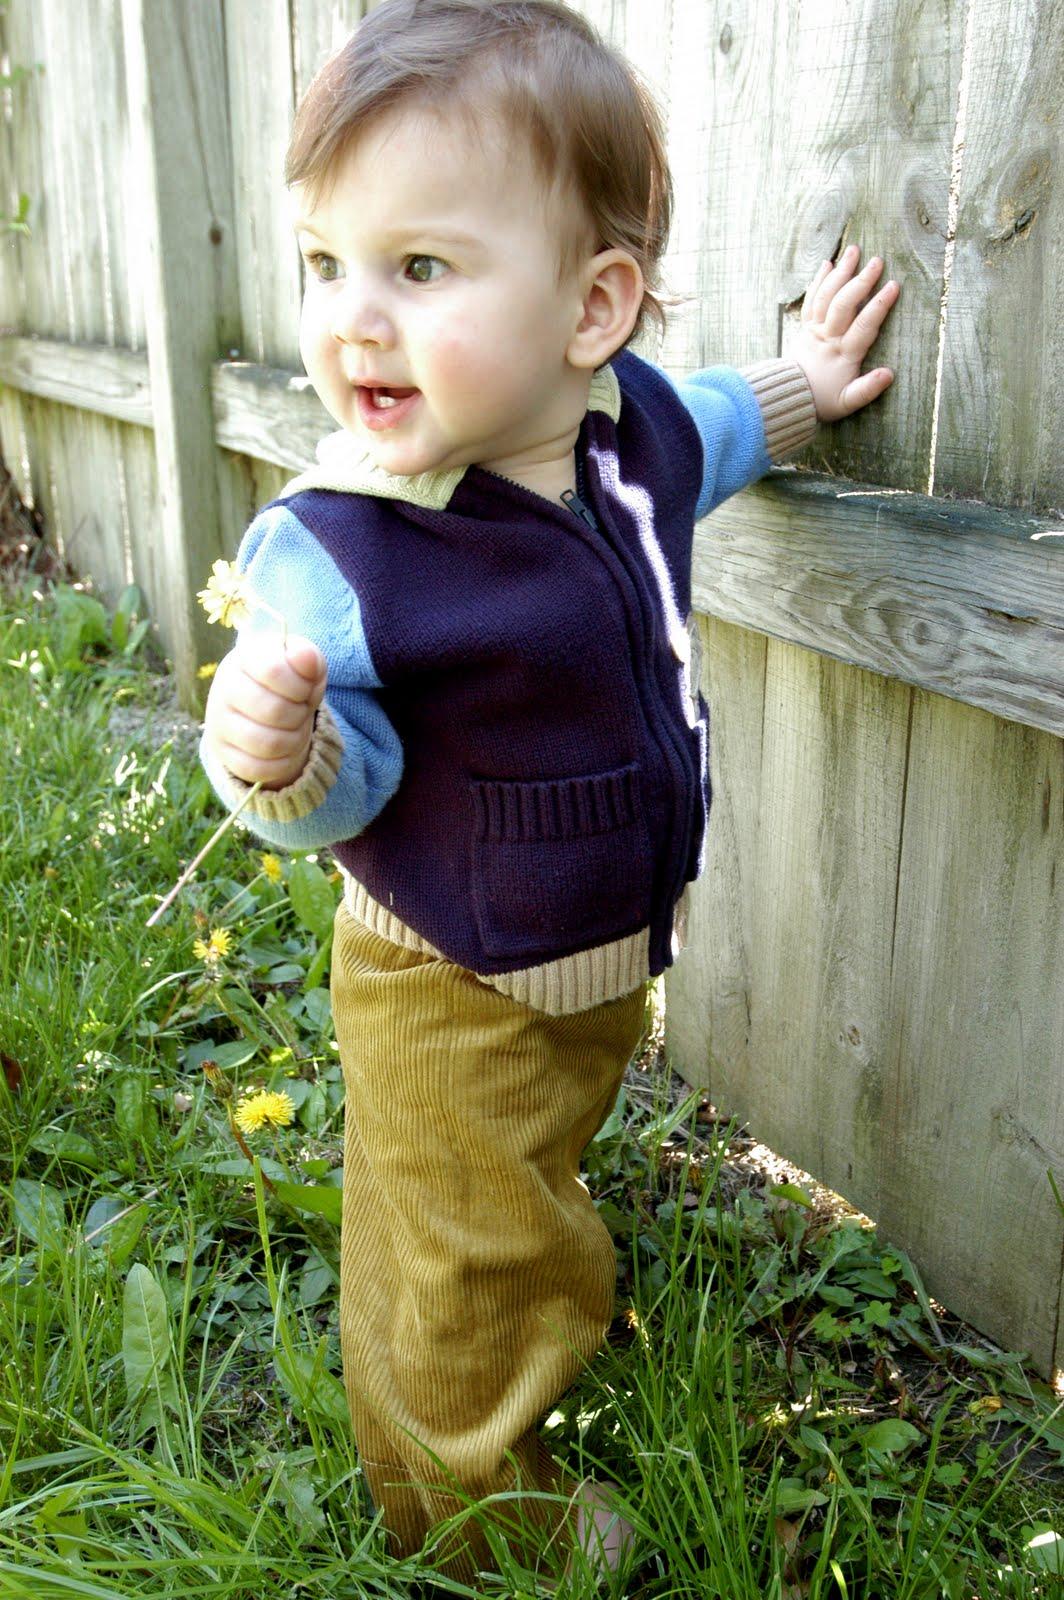 بالصور صور اولاد حلوين , شاهد بالصور اجمل الاطفال الاولاد 429 11